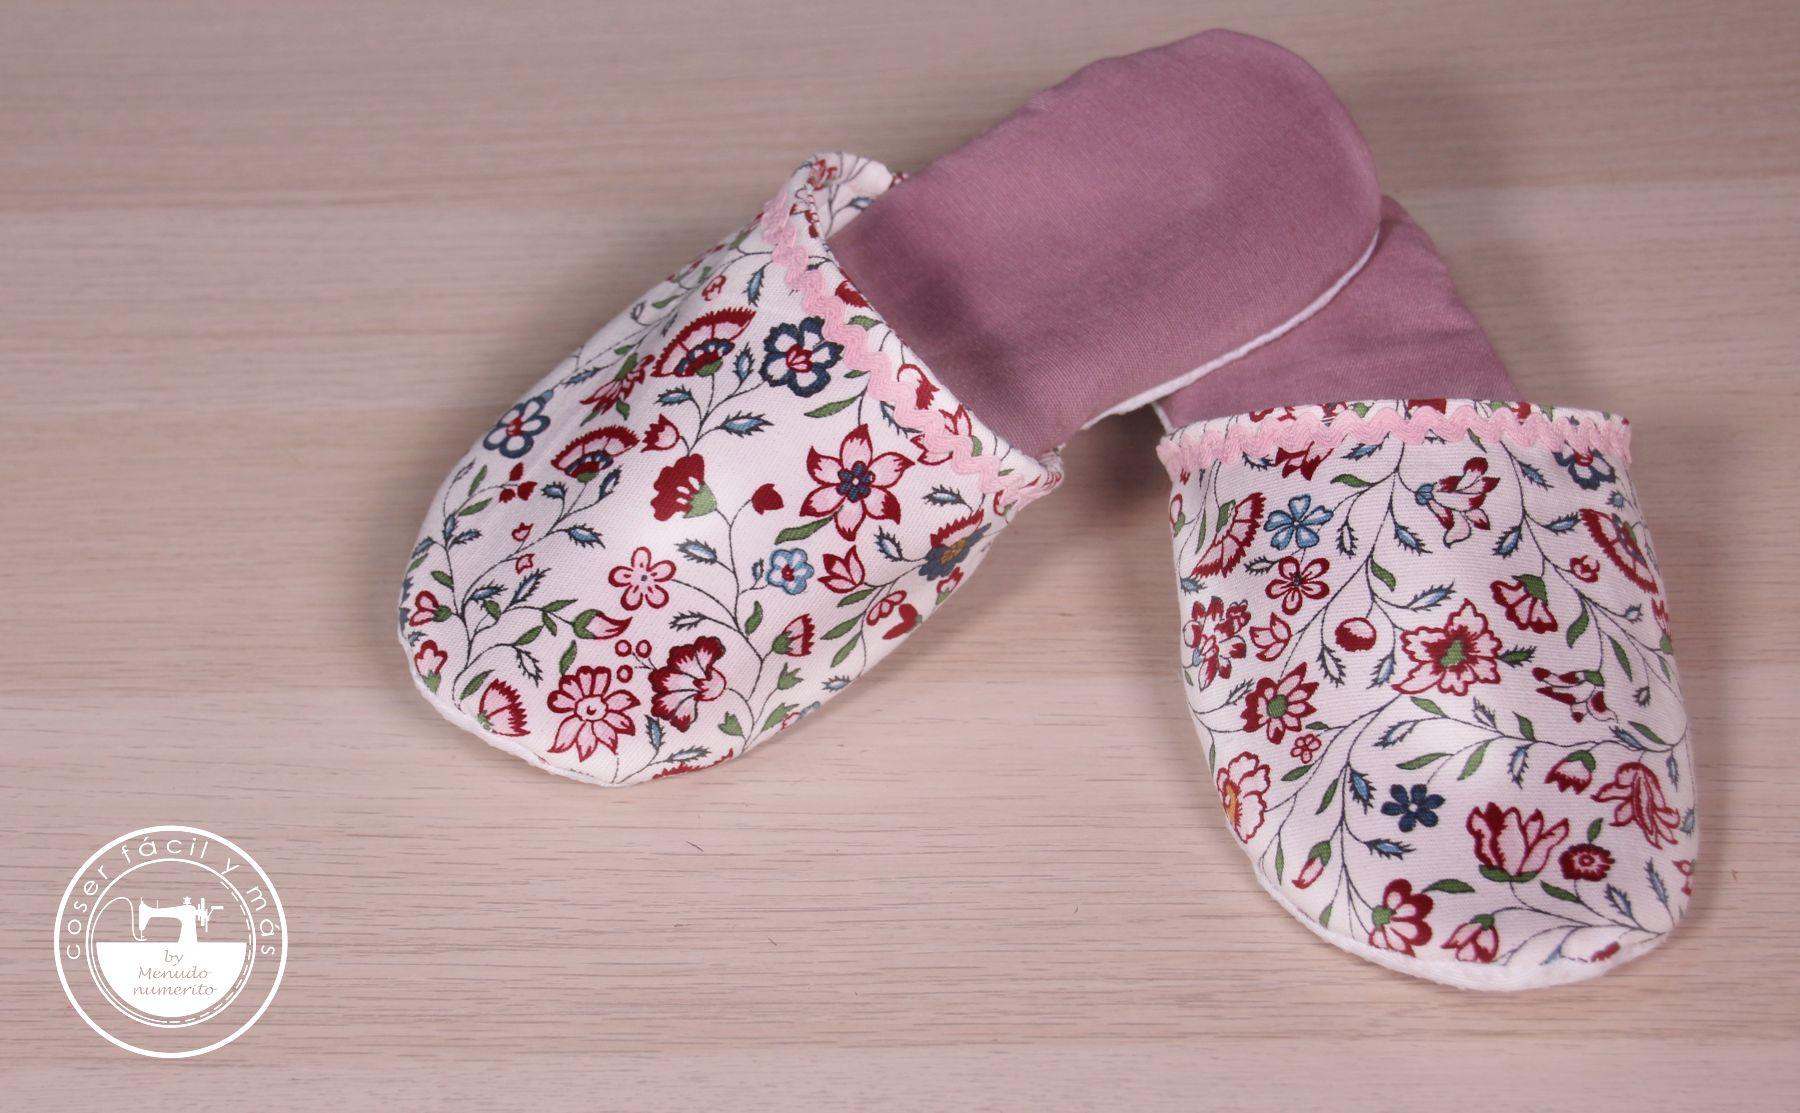 zapatillas de tela coser facil blog de costura